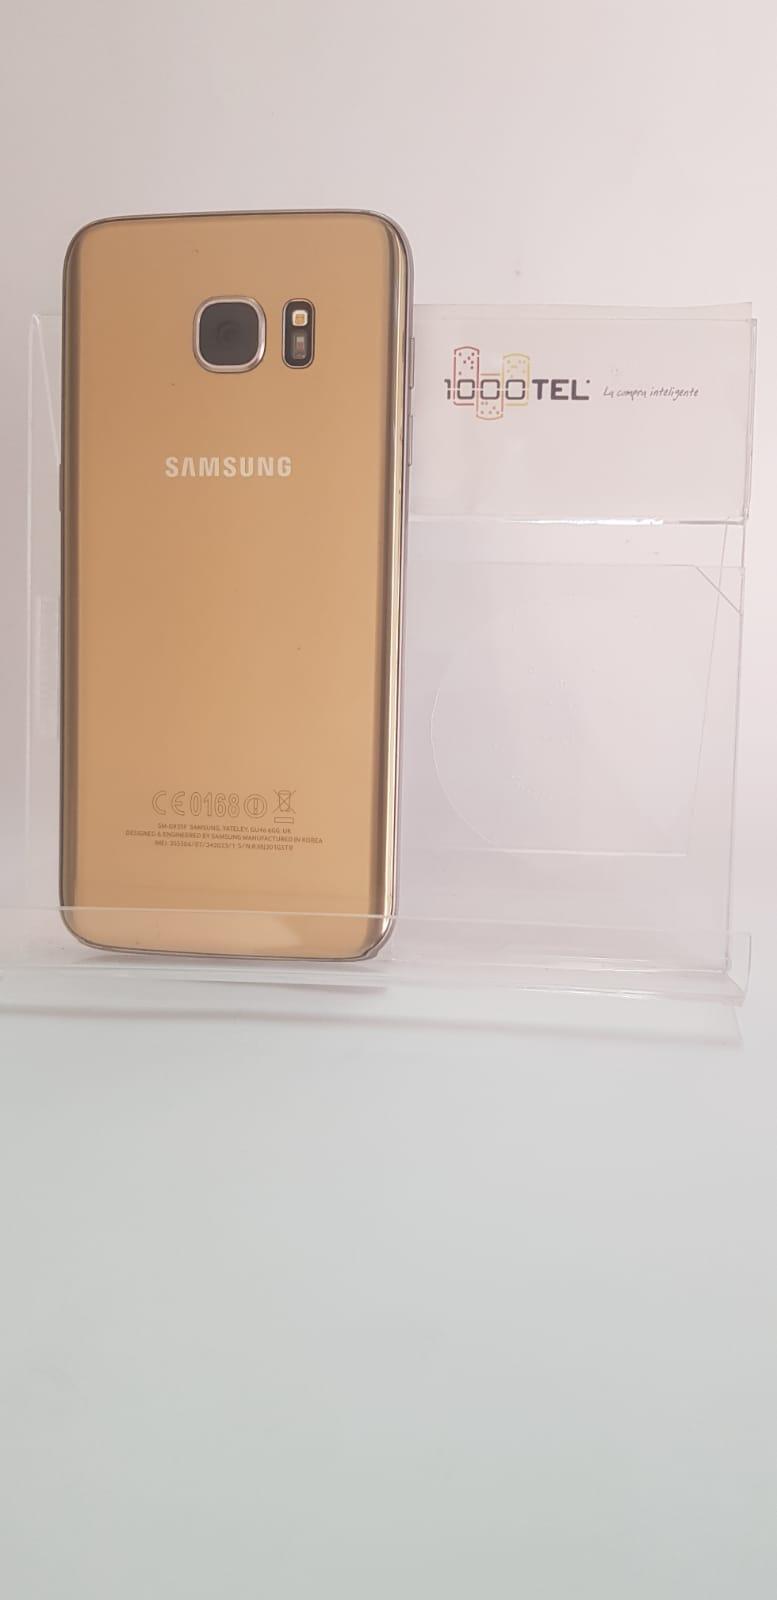 Samsung Galaxy S7 Edge #2